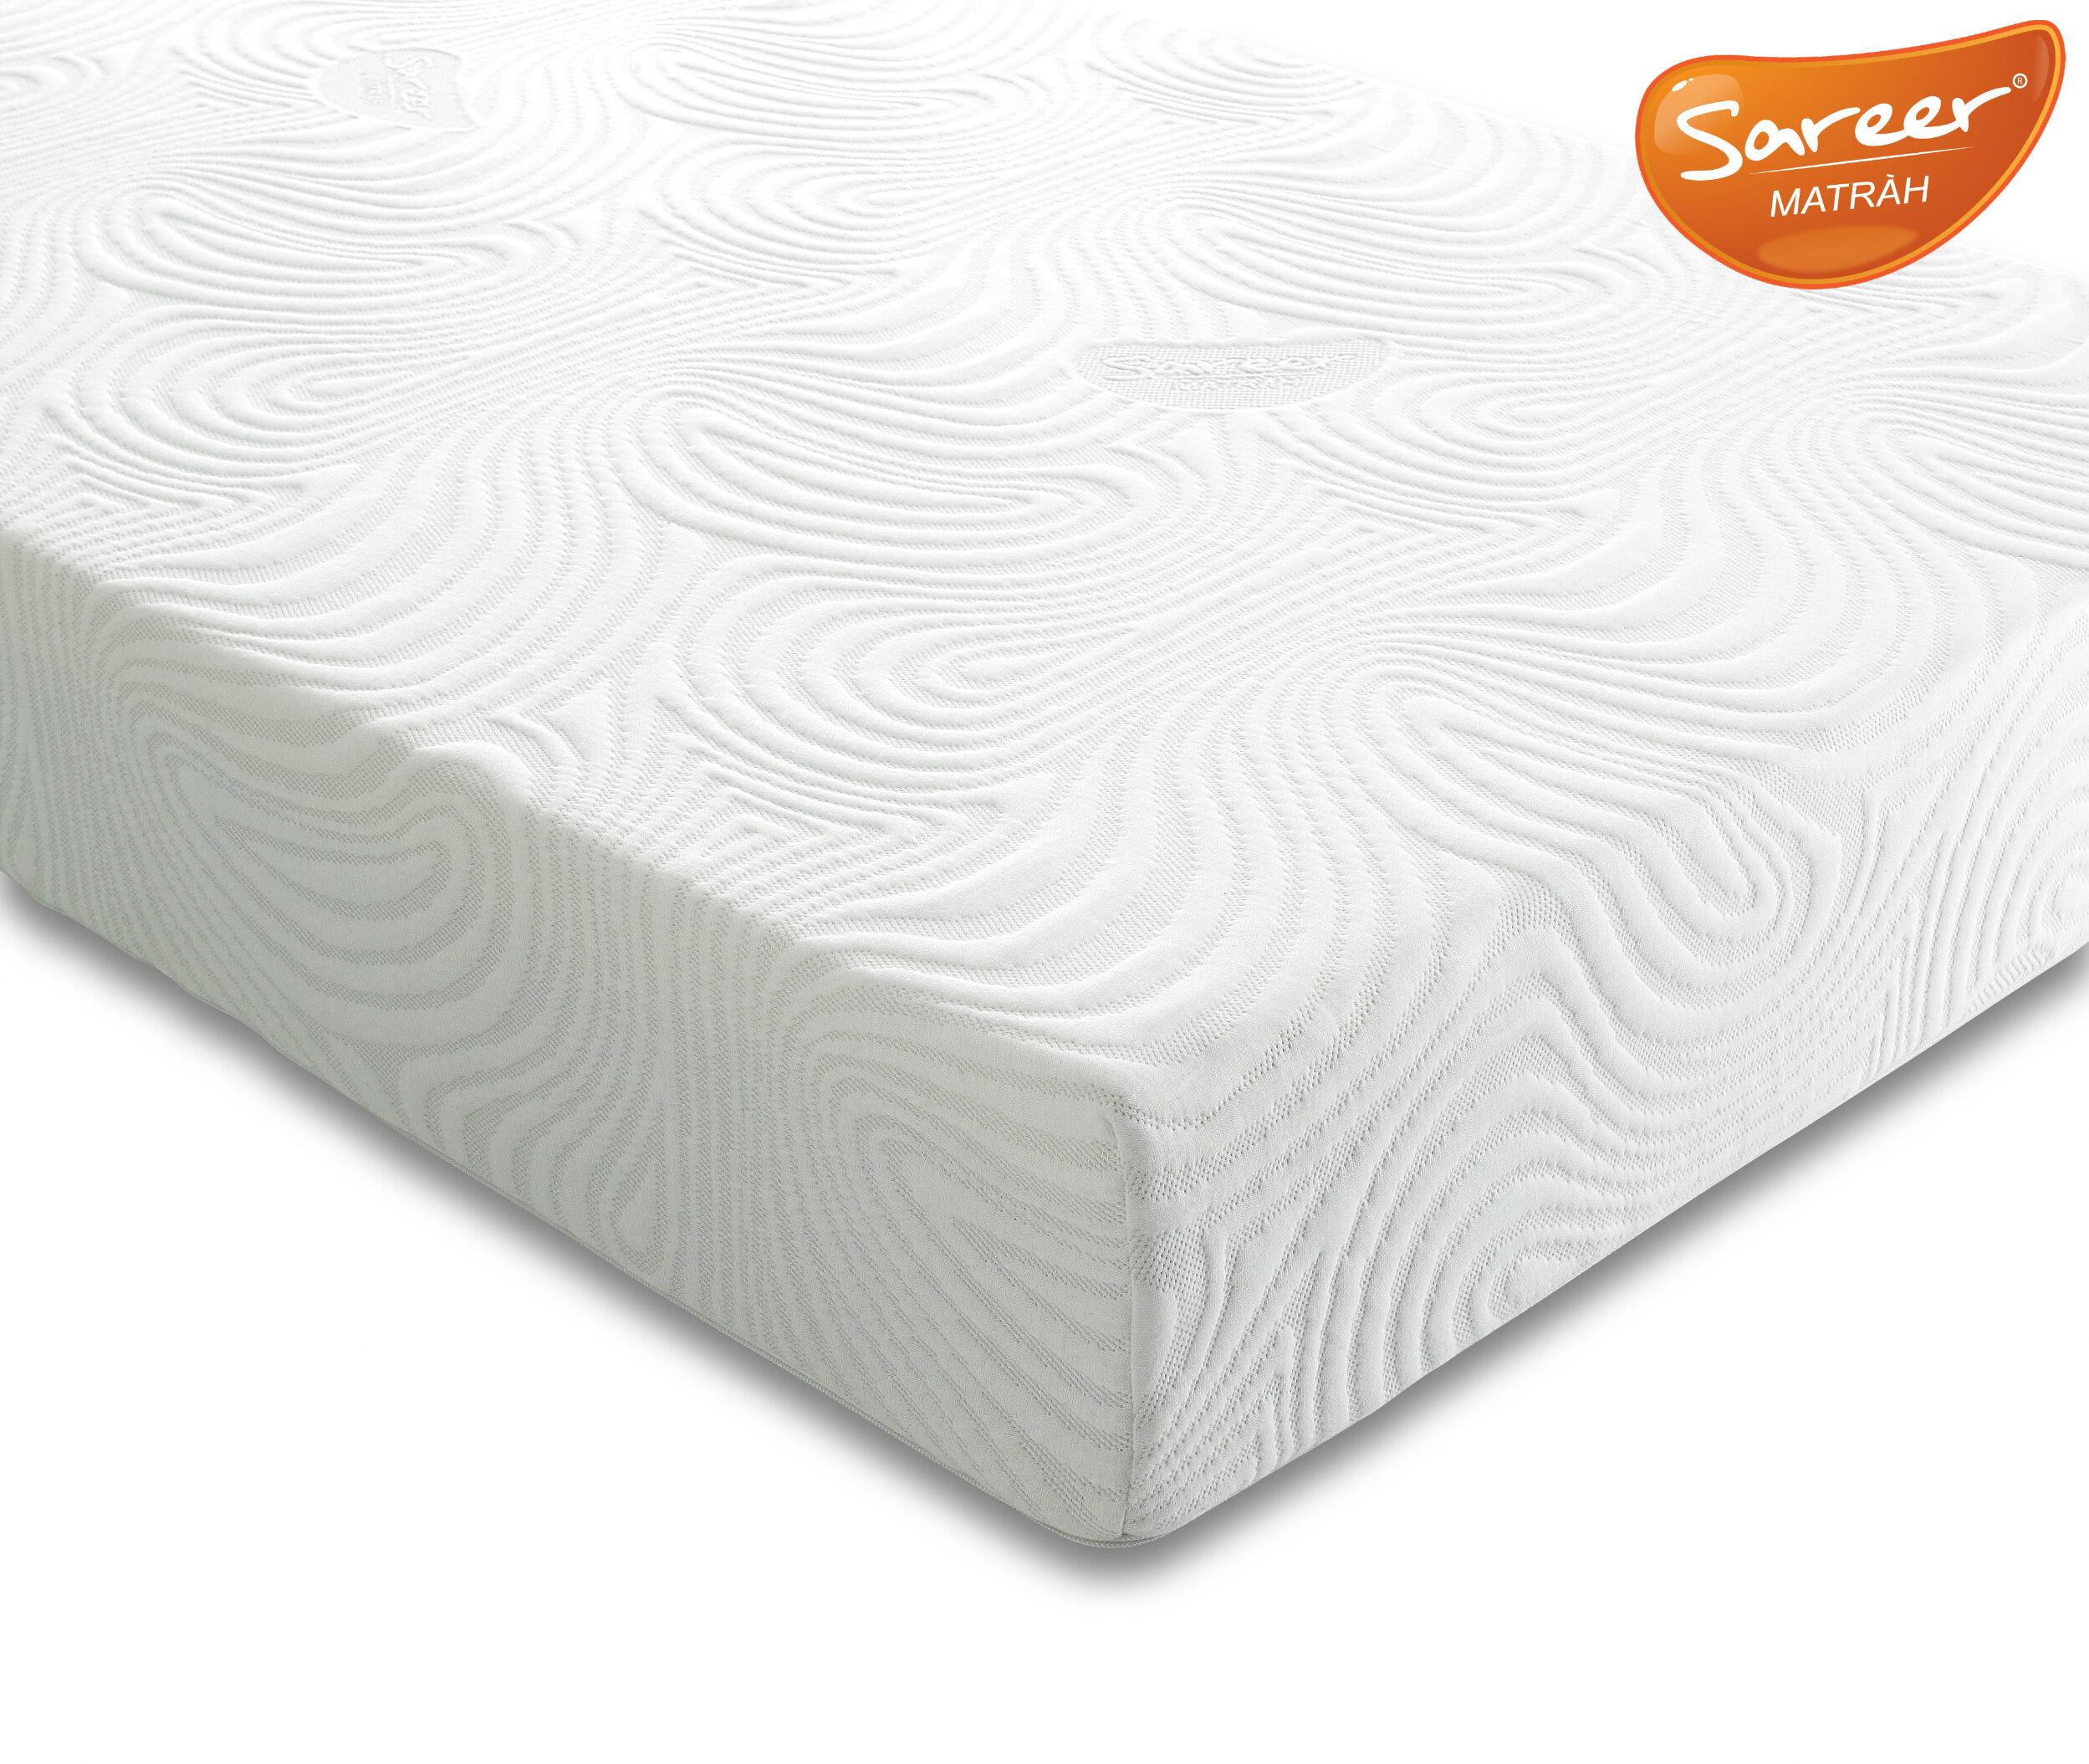 main sareer latex instabeds mattress foam catalogue instabed